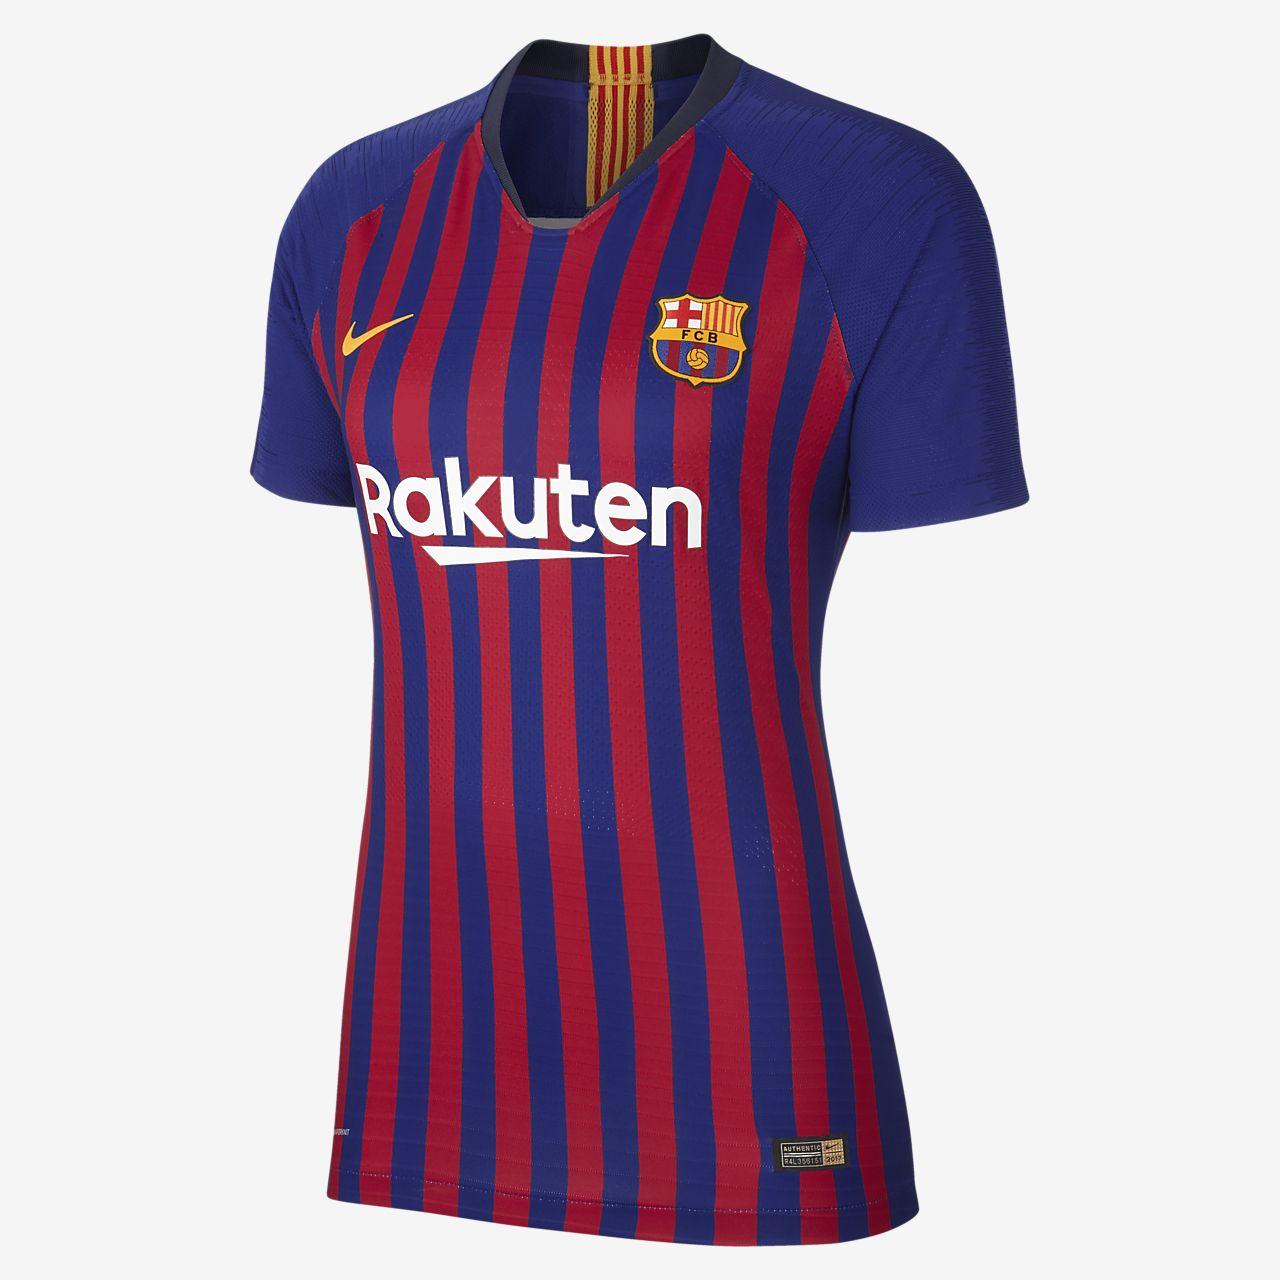 best service 5cd49 1f235 ... Camiseta de fútbol para mujer de local Vapor Match del FC Barcelona 2018  19